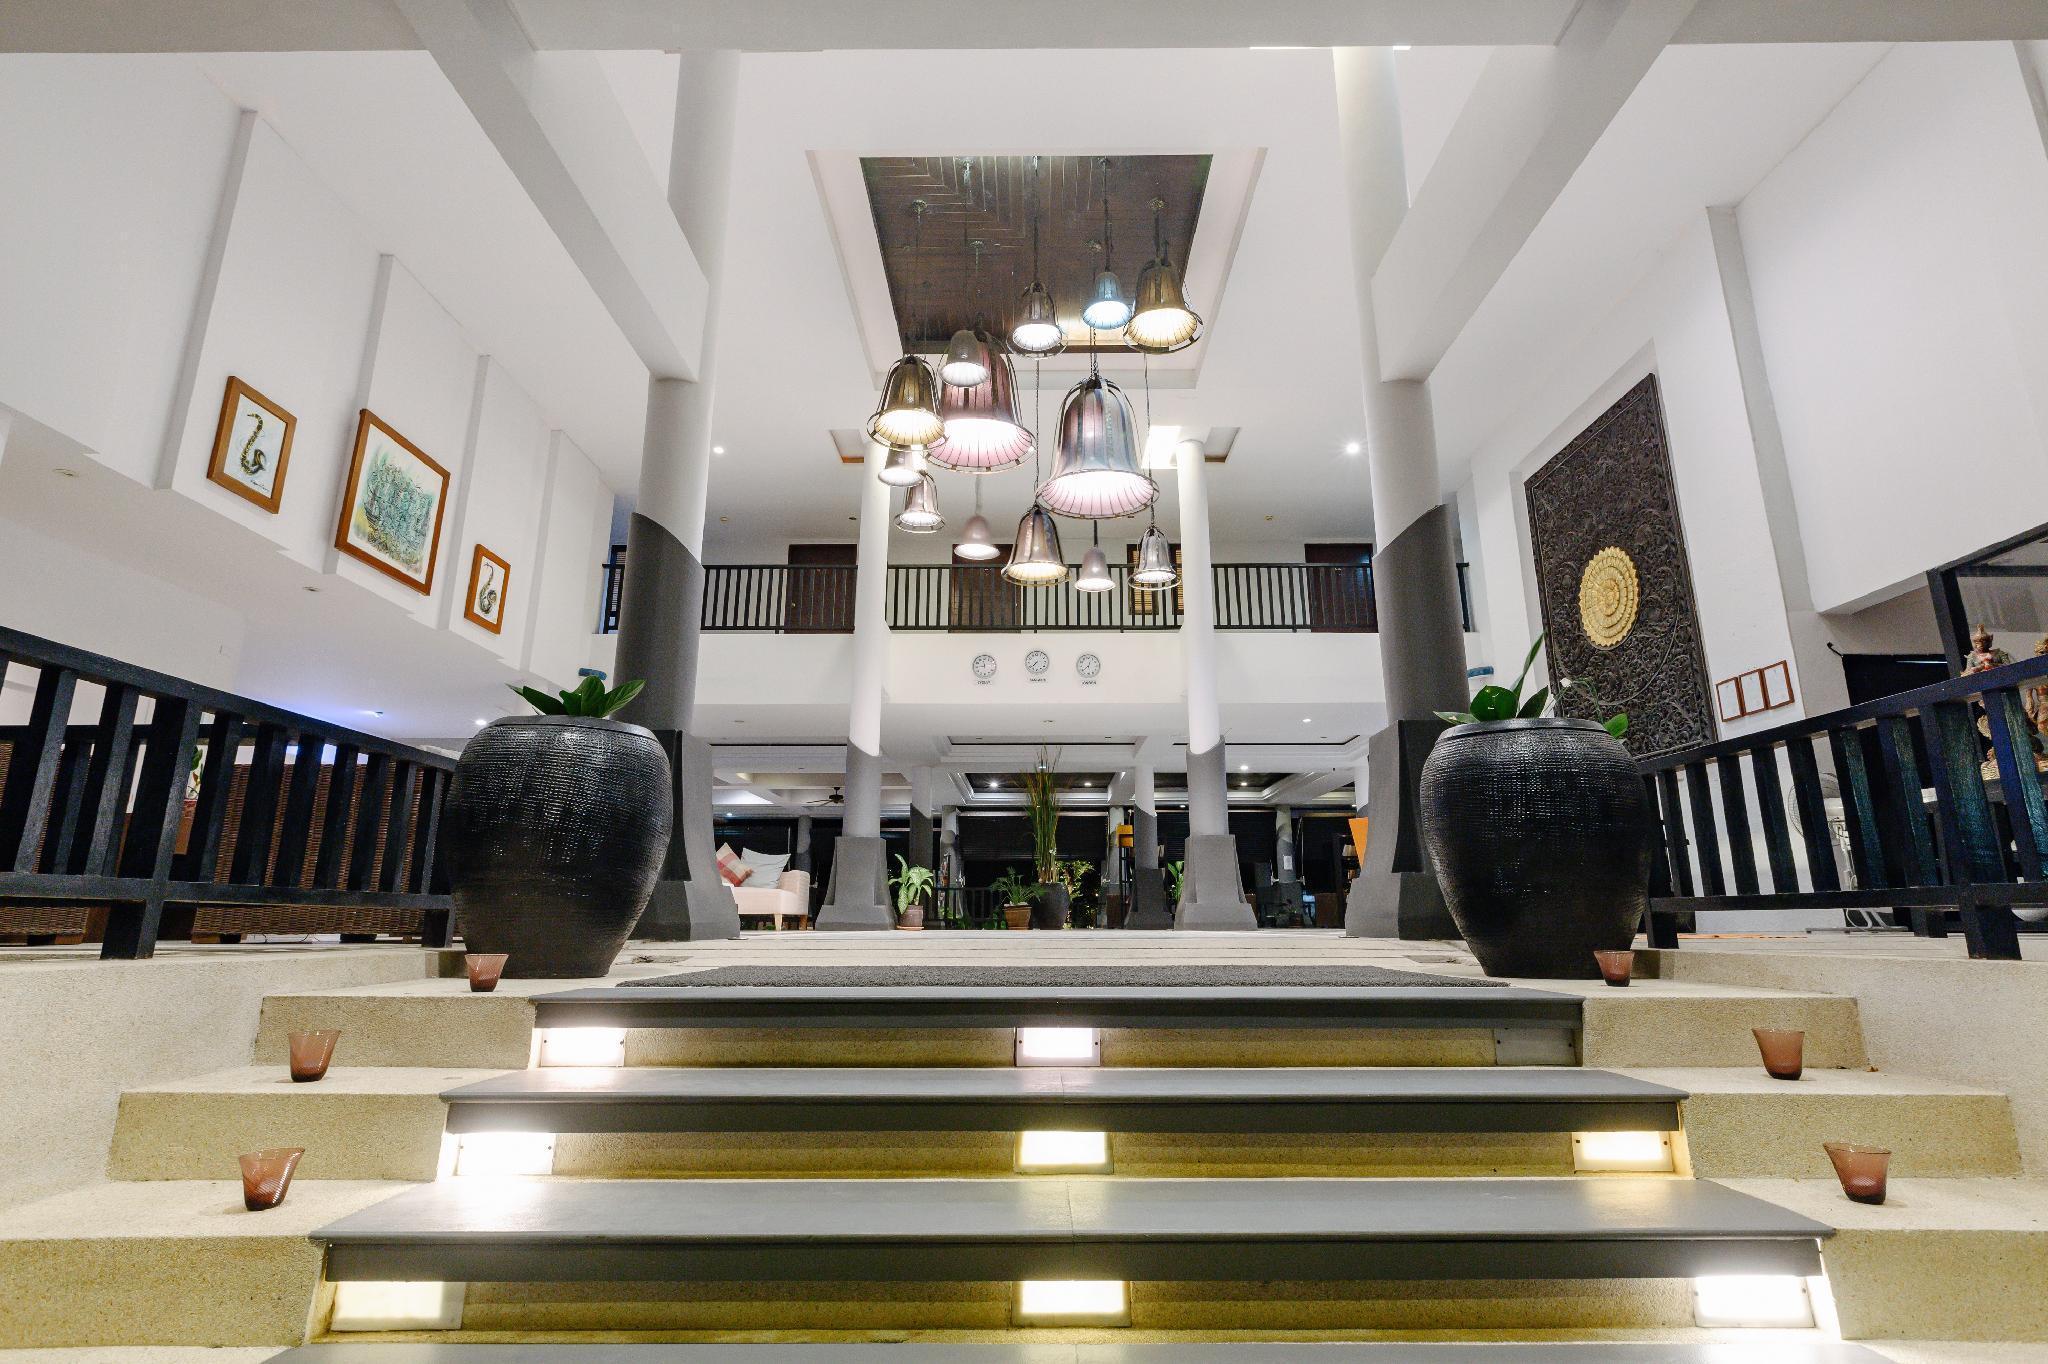 Samaya Bura Beach Resort - Koh Samui สมายา บุรา บีช รีสอร์ต - เกาะสมุย